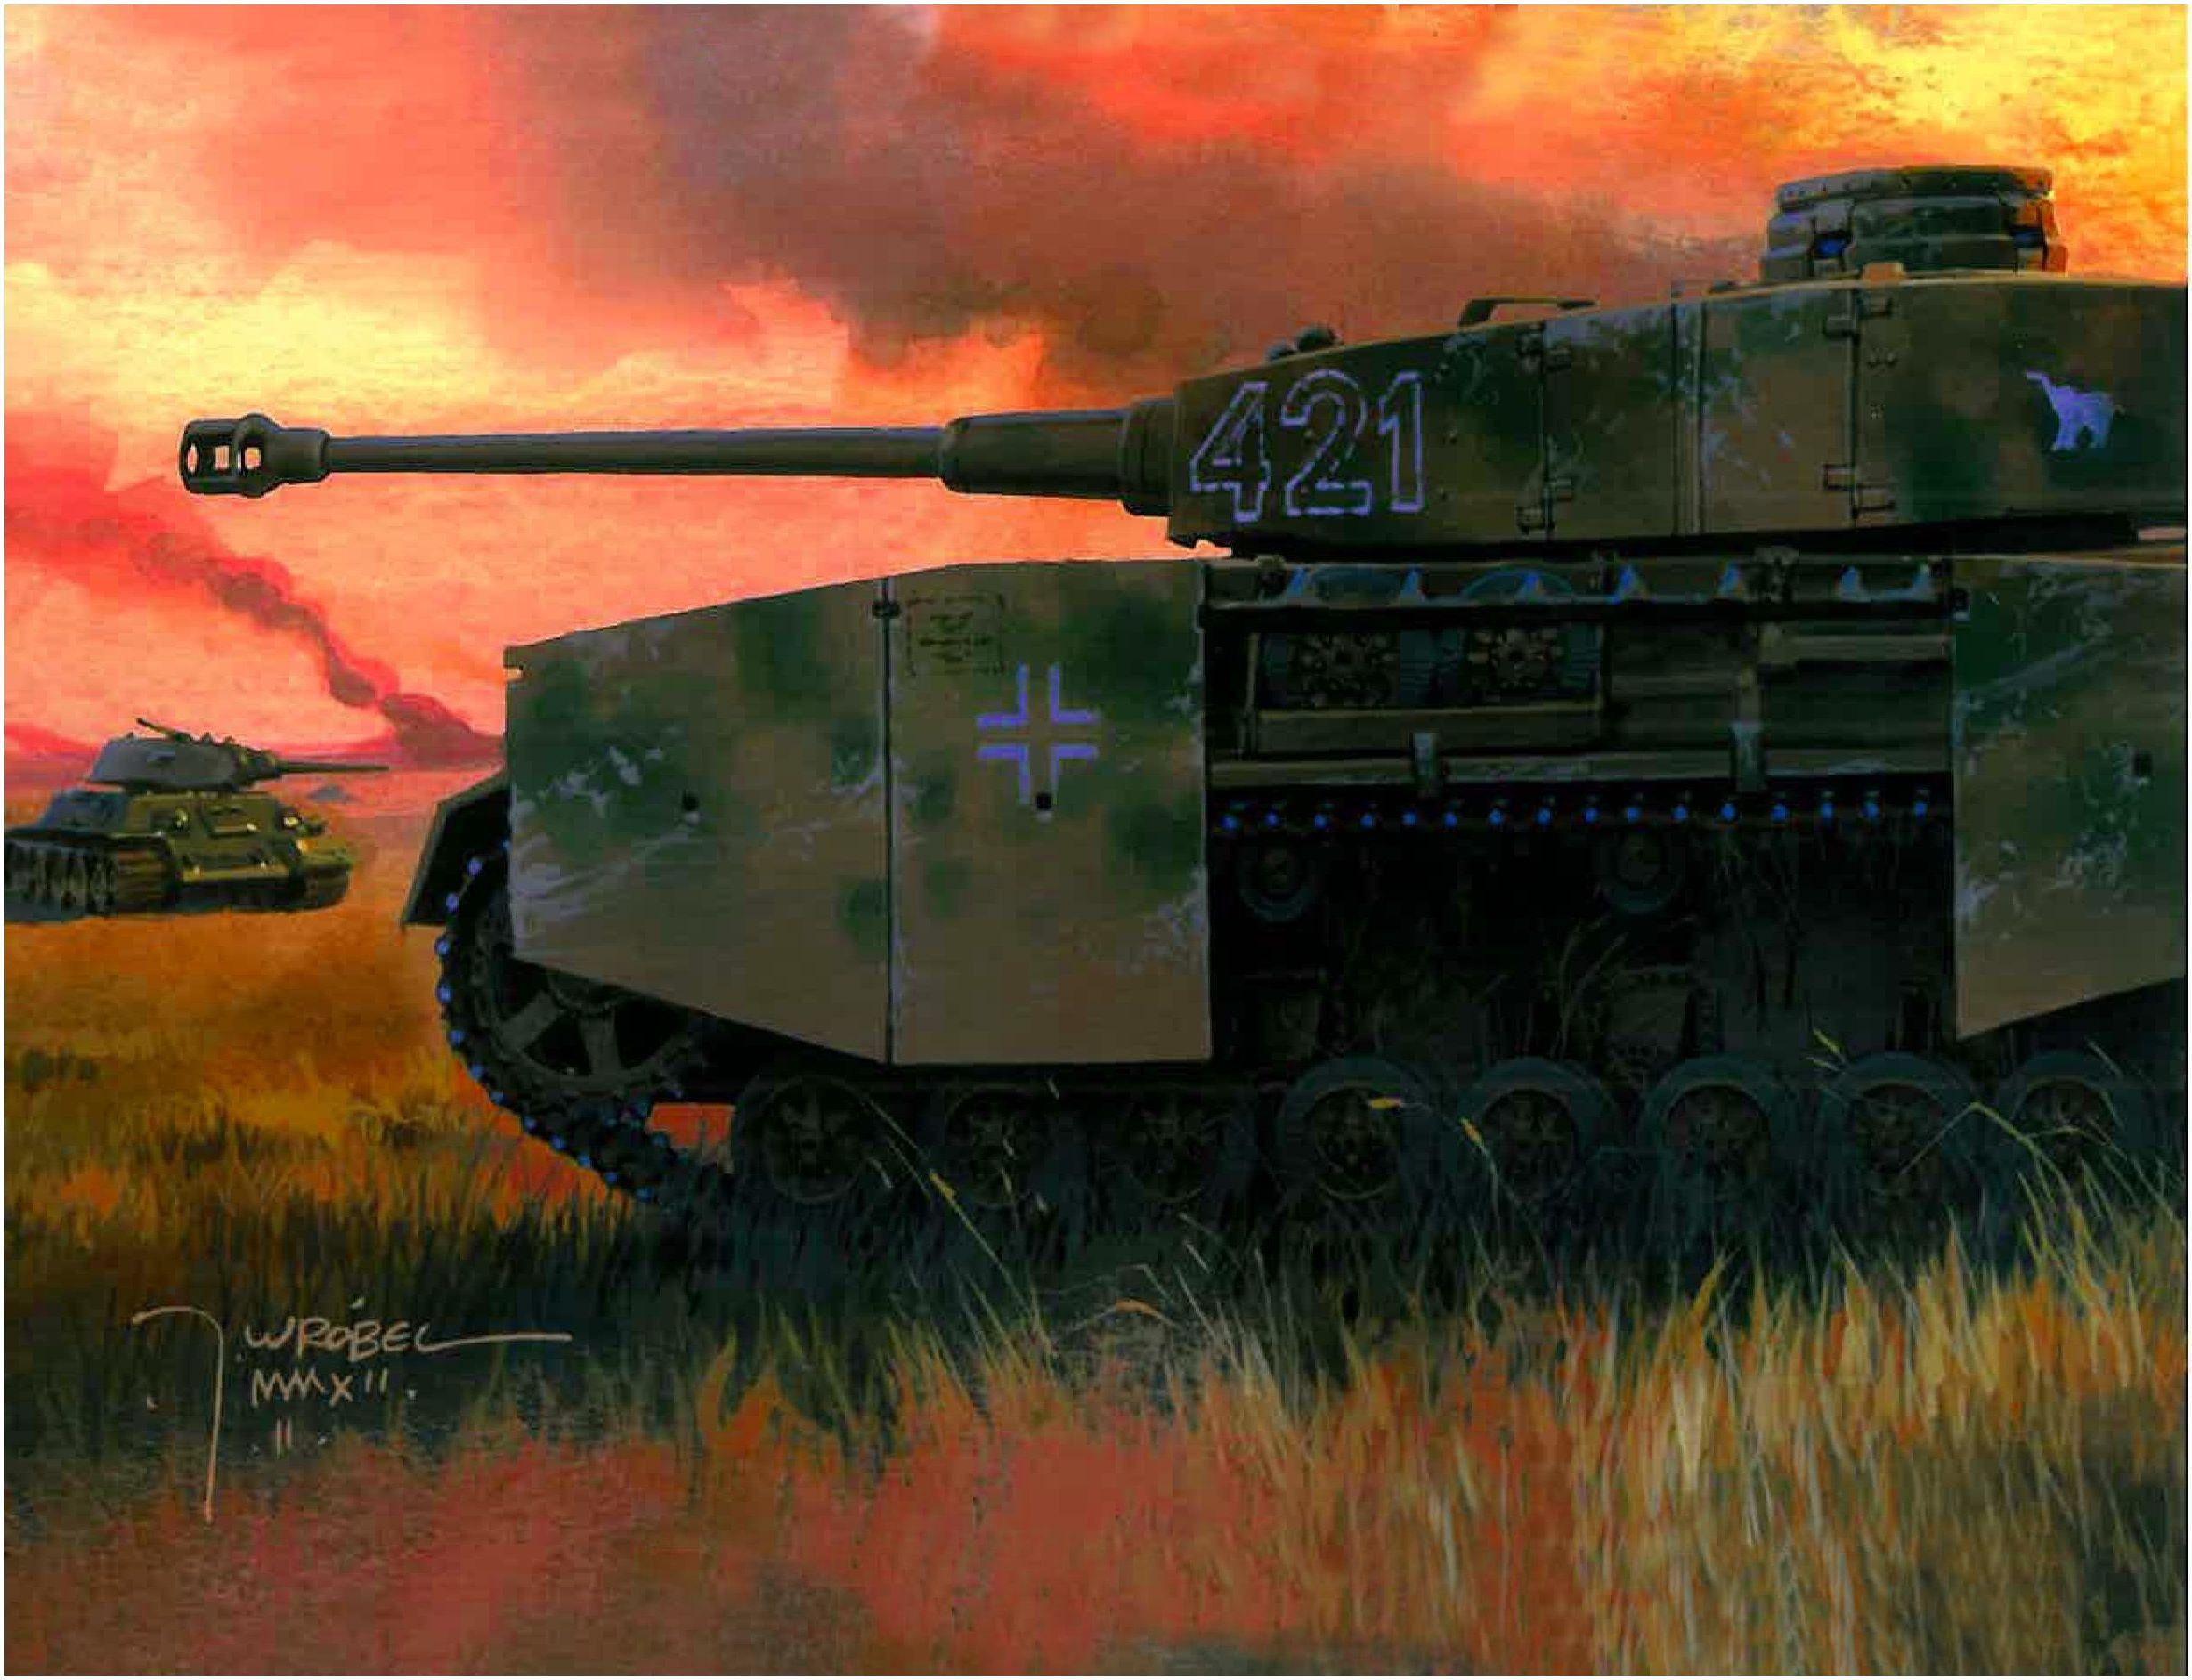 Wrobel Jaroslaw. Танк Panzer IV Ausf. H.